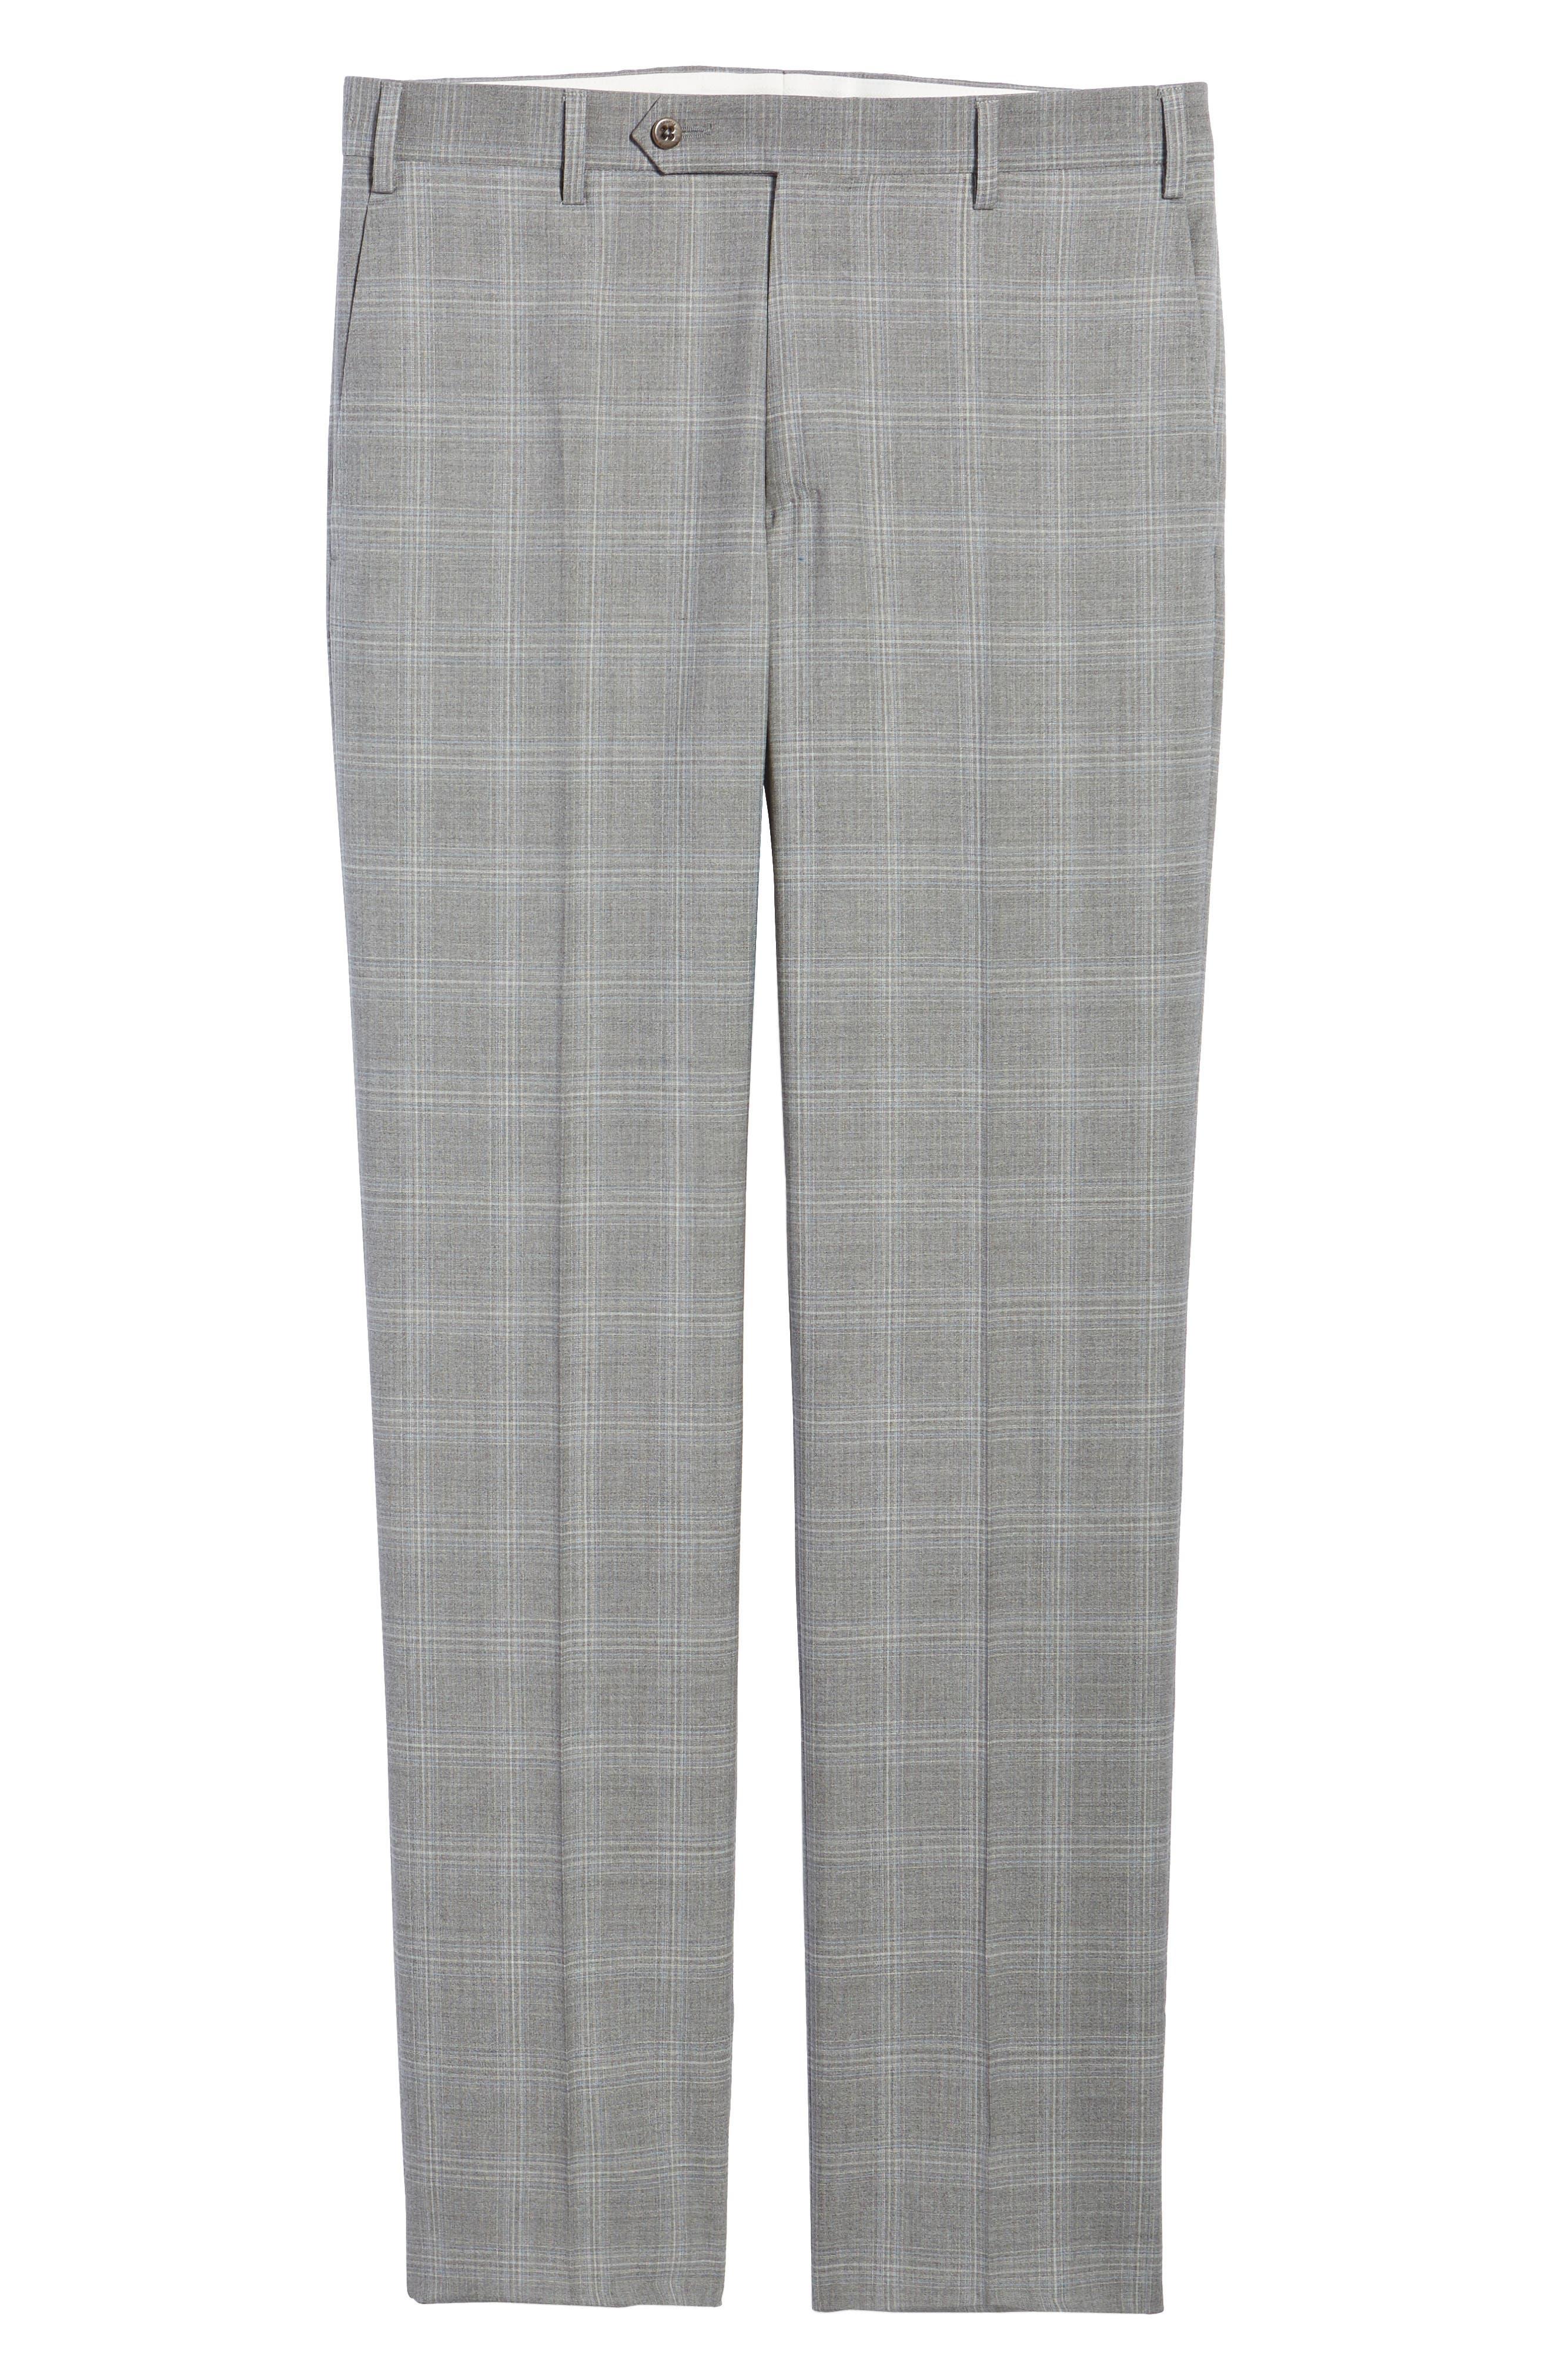 Devon Flat Front Plaid Wool Trousers,                             Alternate thumbnail 6, color,                             Light Grey